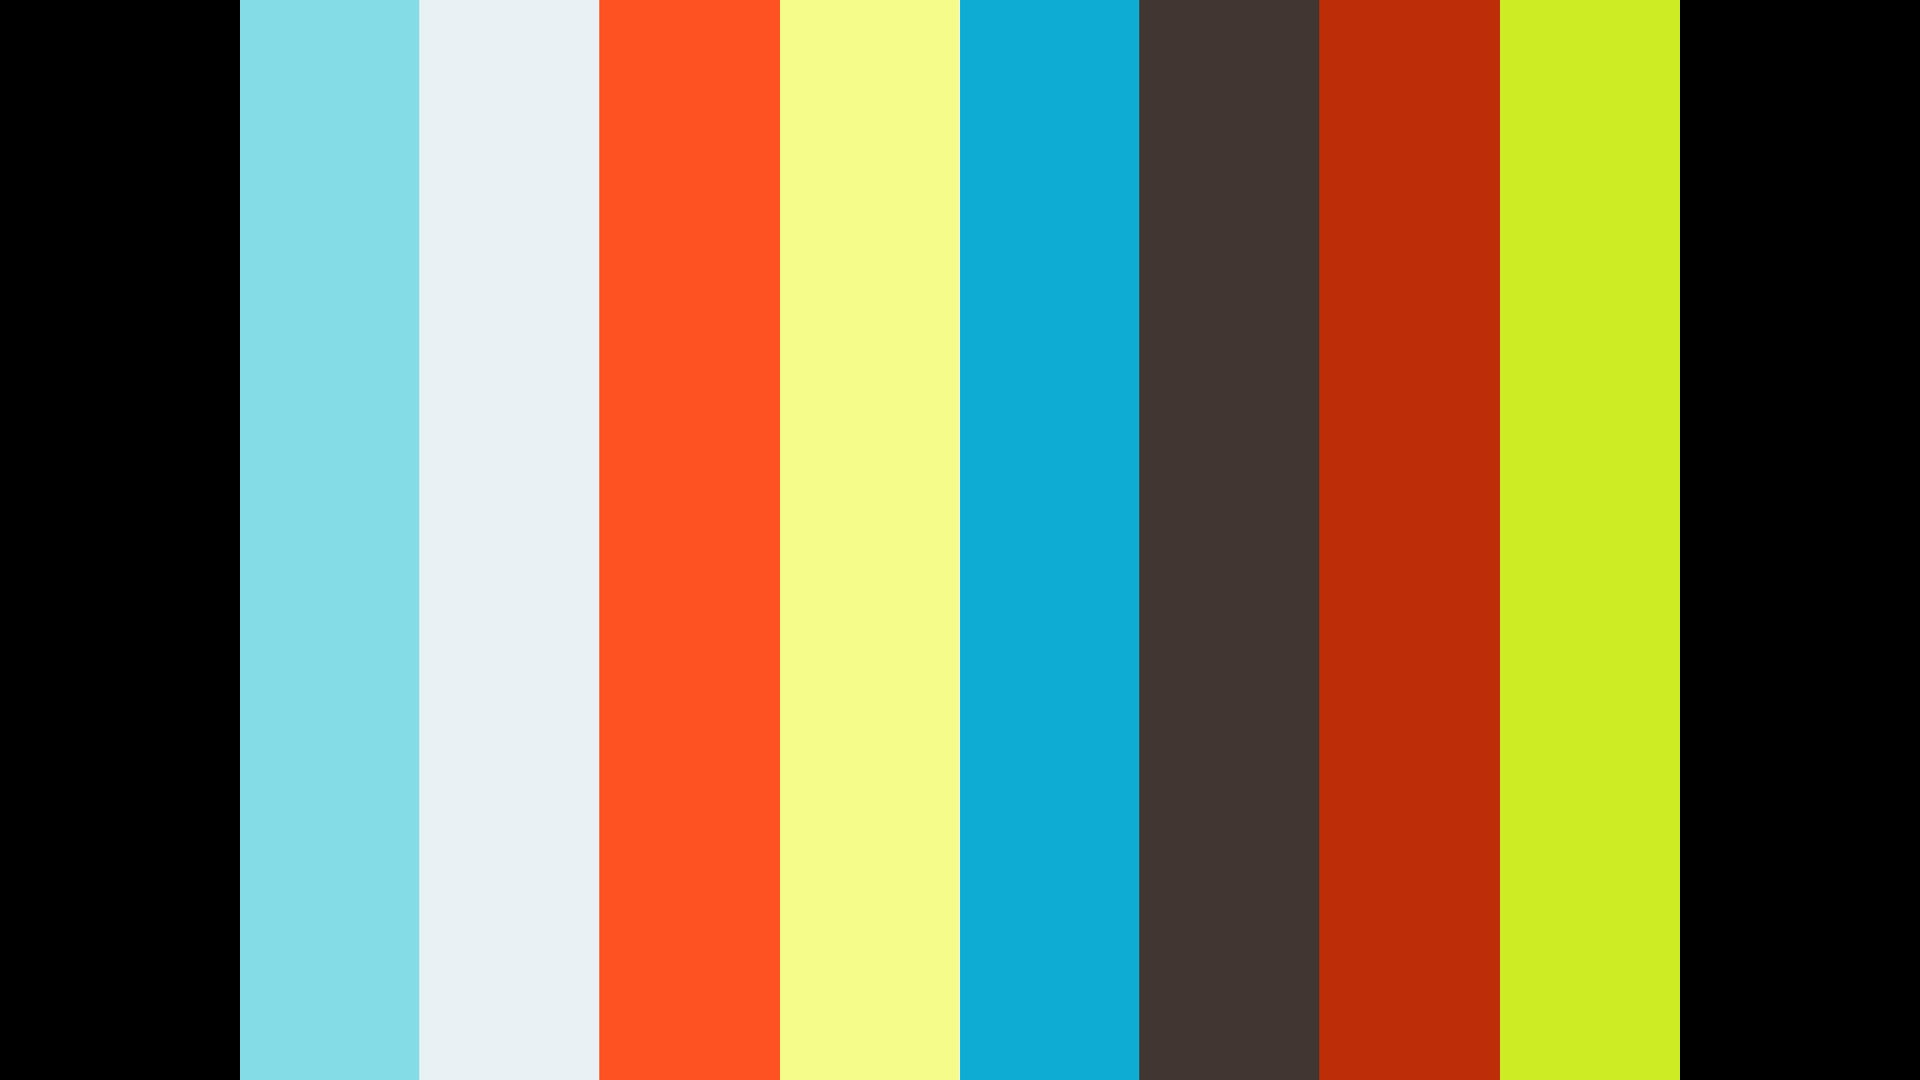 23122020 auguri bande pompeiana pietrabruna